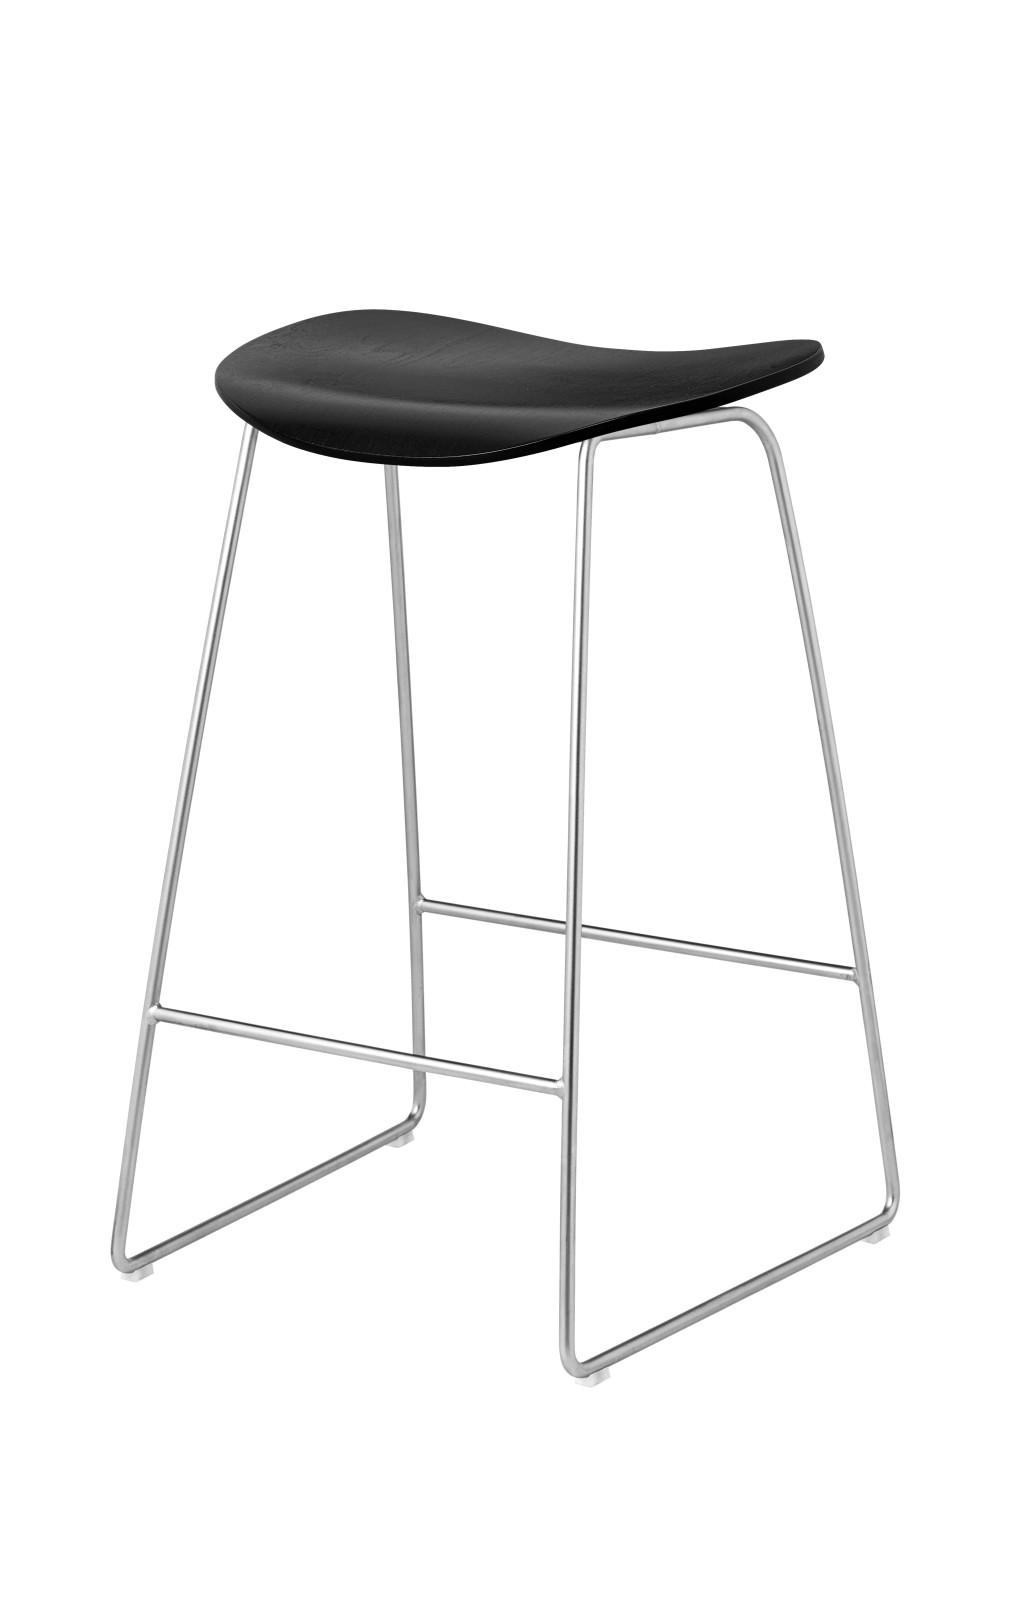 Gubi 2D Counter Stool Sledge Base - Unupholstered Gubi Wood Black Stained Birch, Gubi Metal Chrome